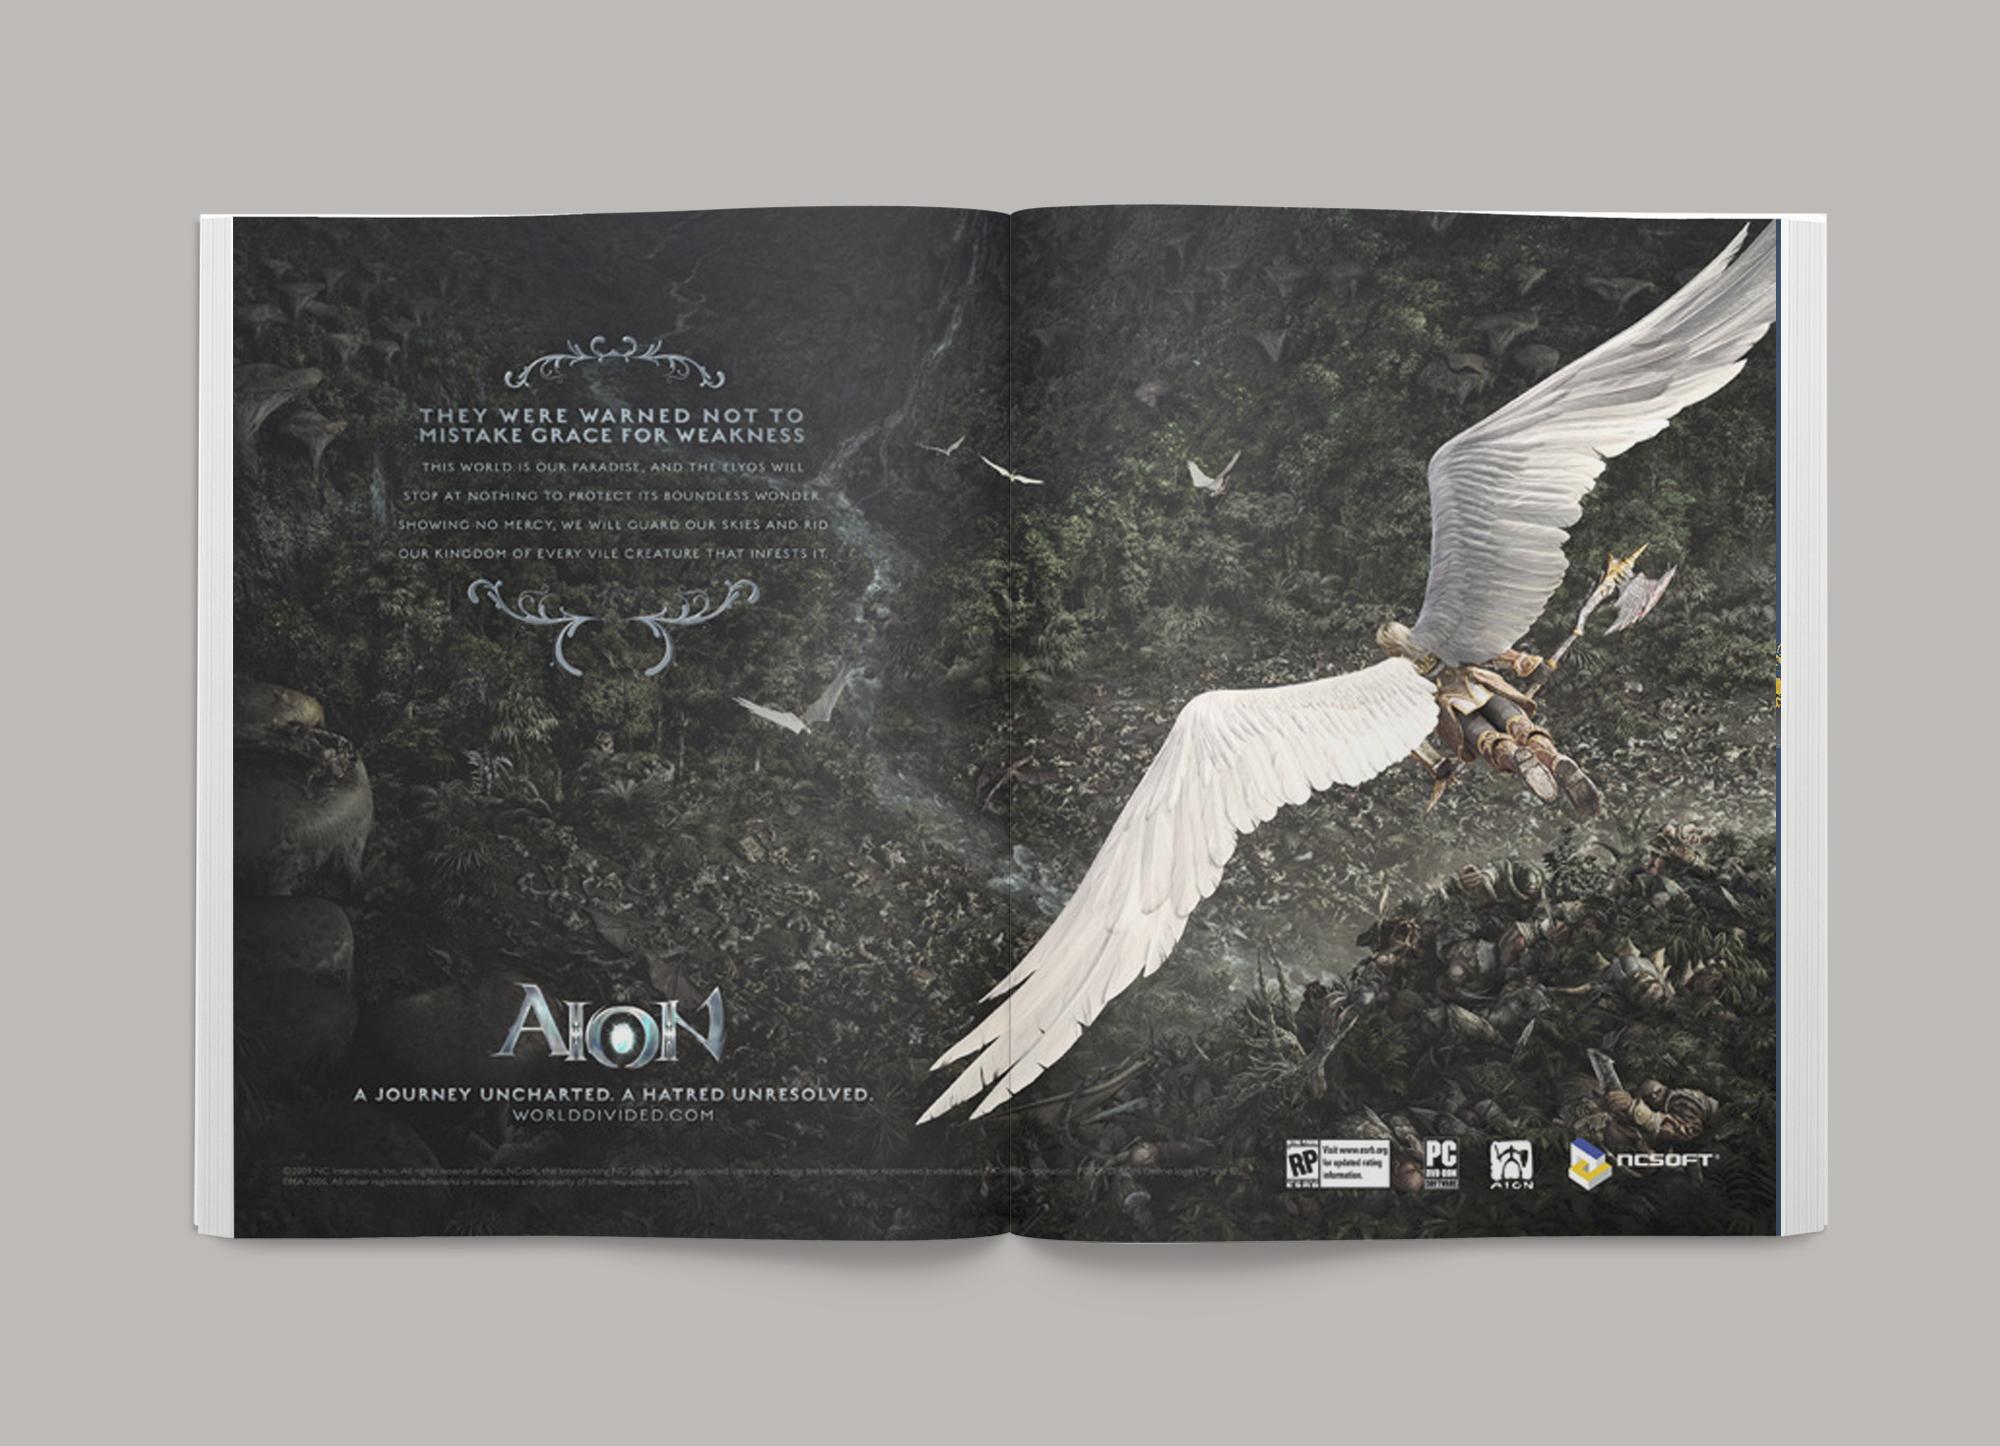 Aion_SpreadAds_OpenMagazine_Black.jpg